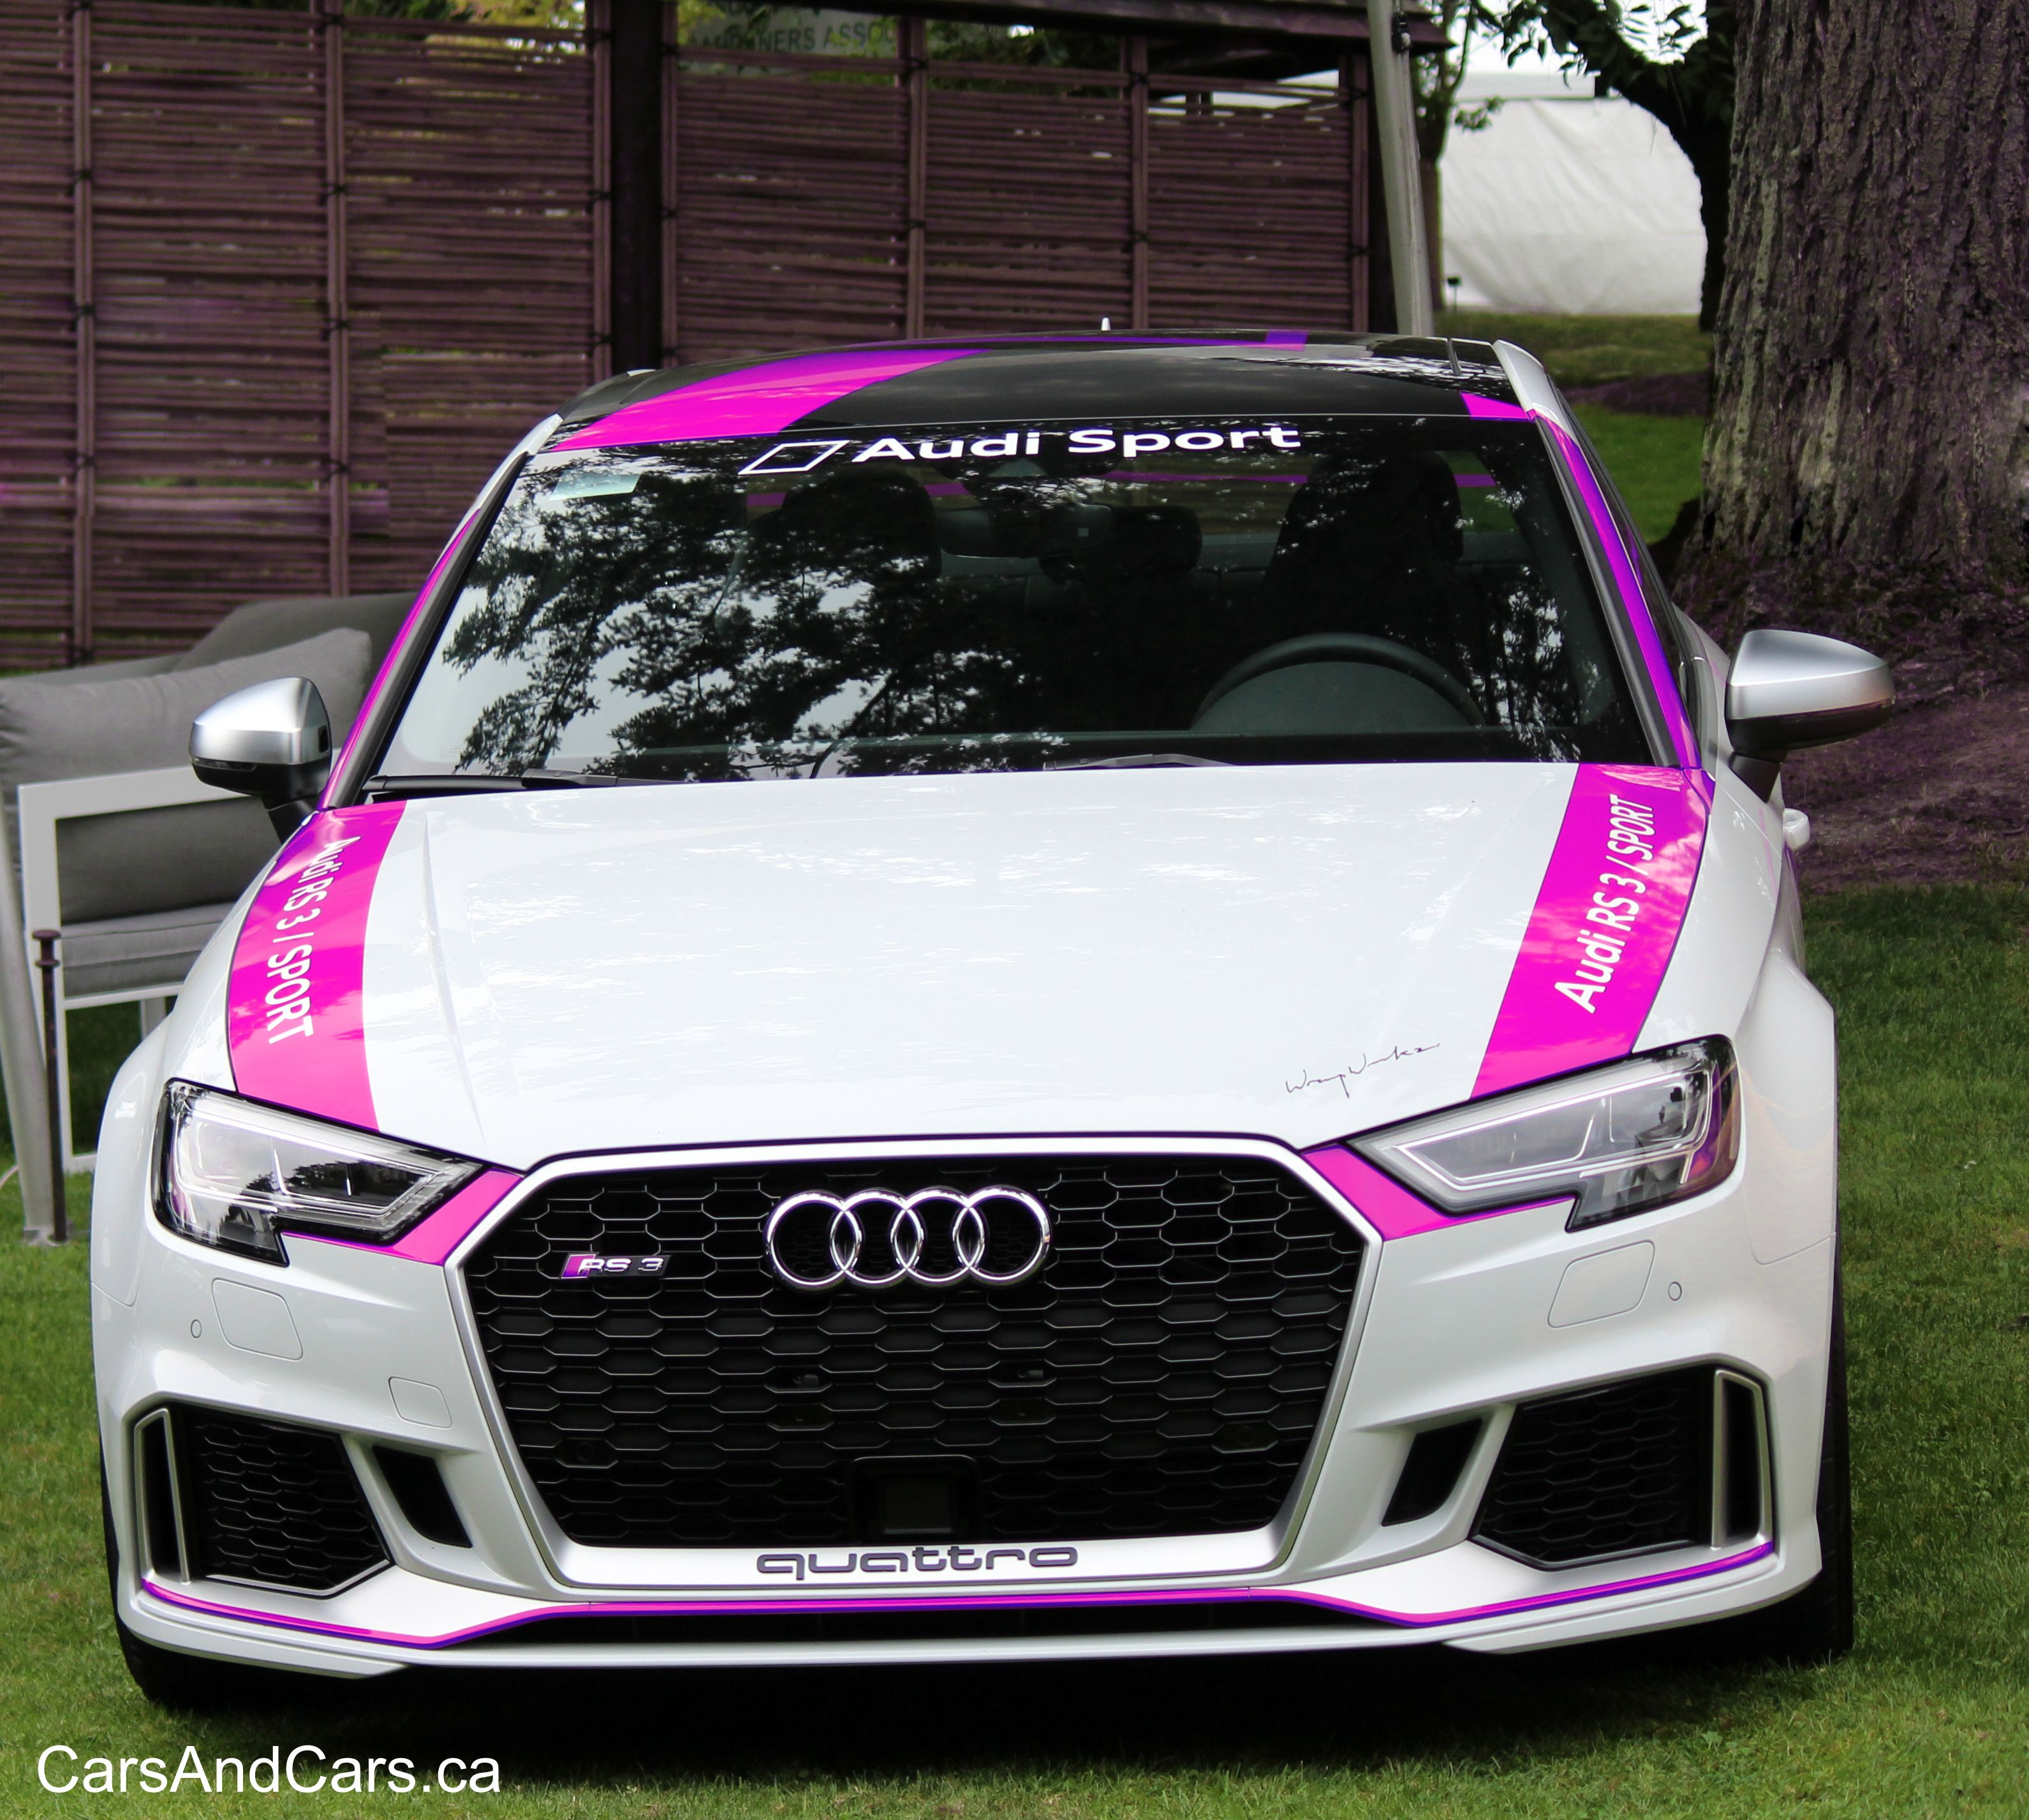 Audi Rs3 Quattro In 2020 Used Audi Audi Audi For Sale